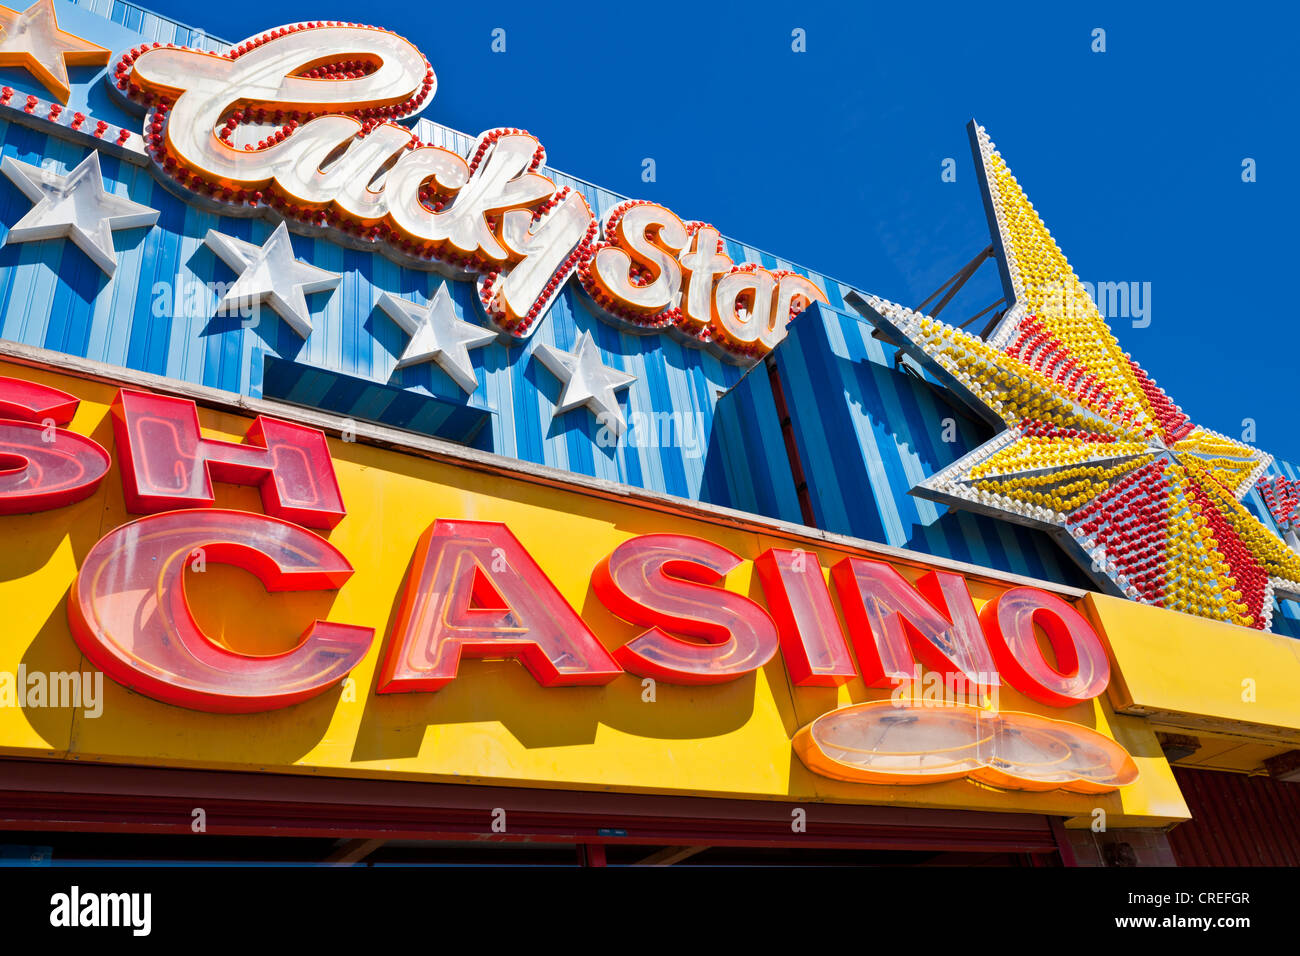 Lucky star casino and amusement arcade sign neon lights Blackpool promenade golden mile Lancashire England UK GB Stock Photo